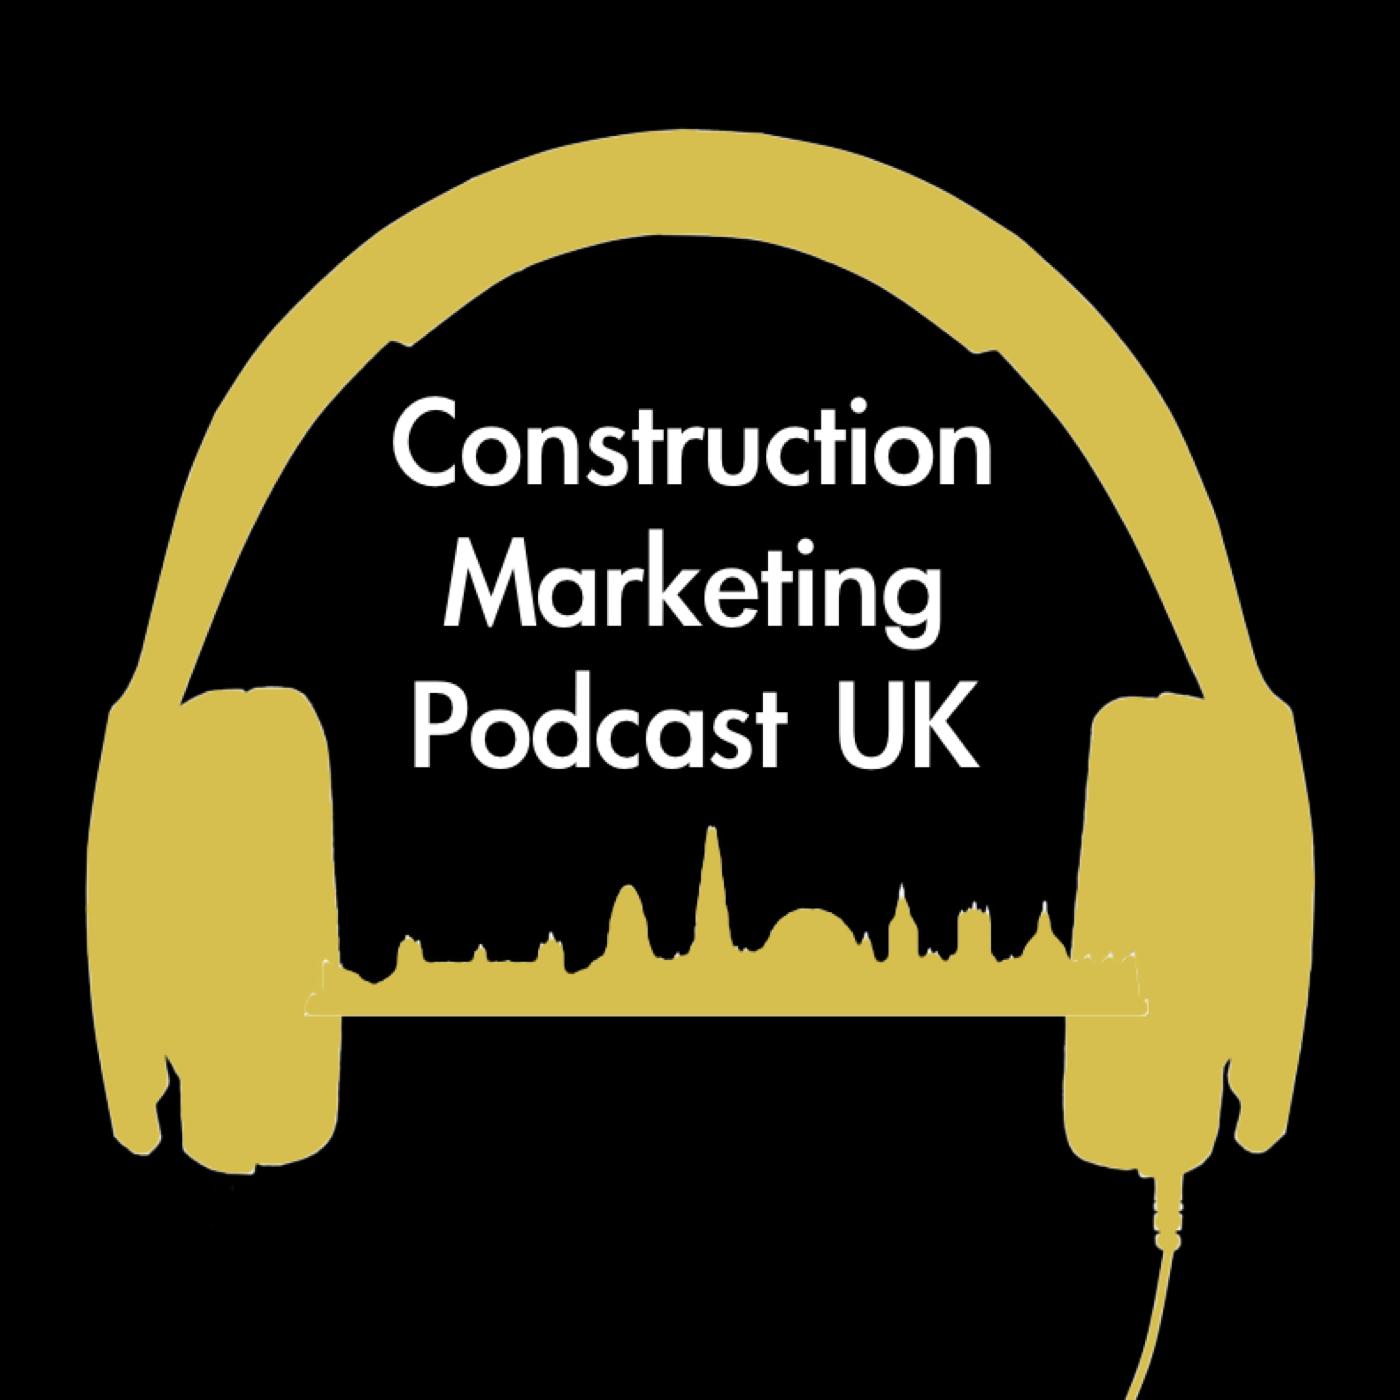 Construction Marketing Podcast